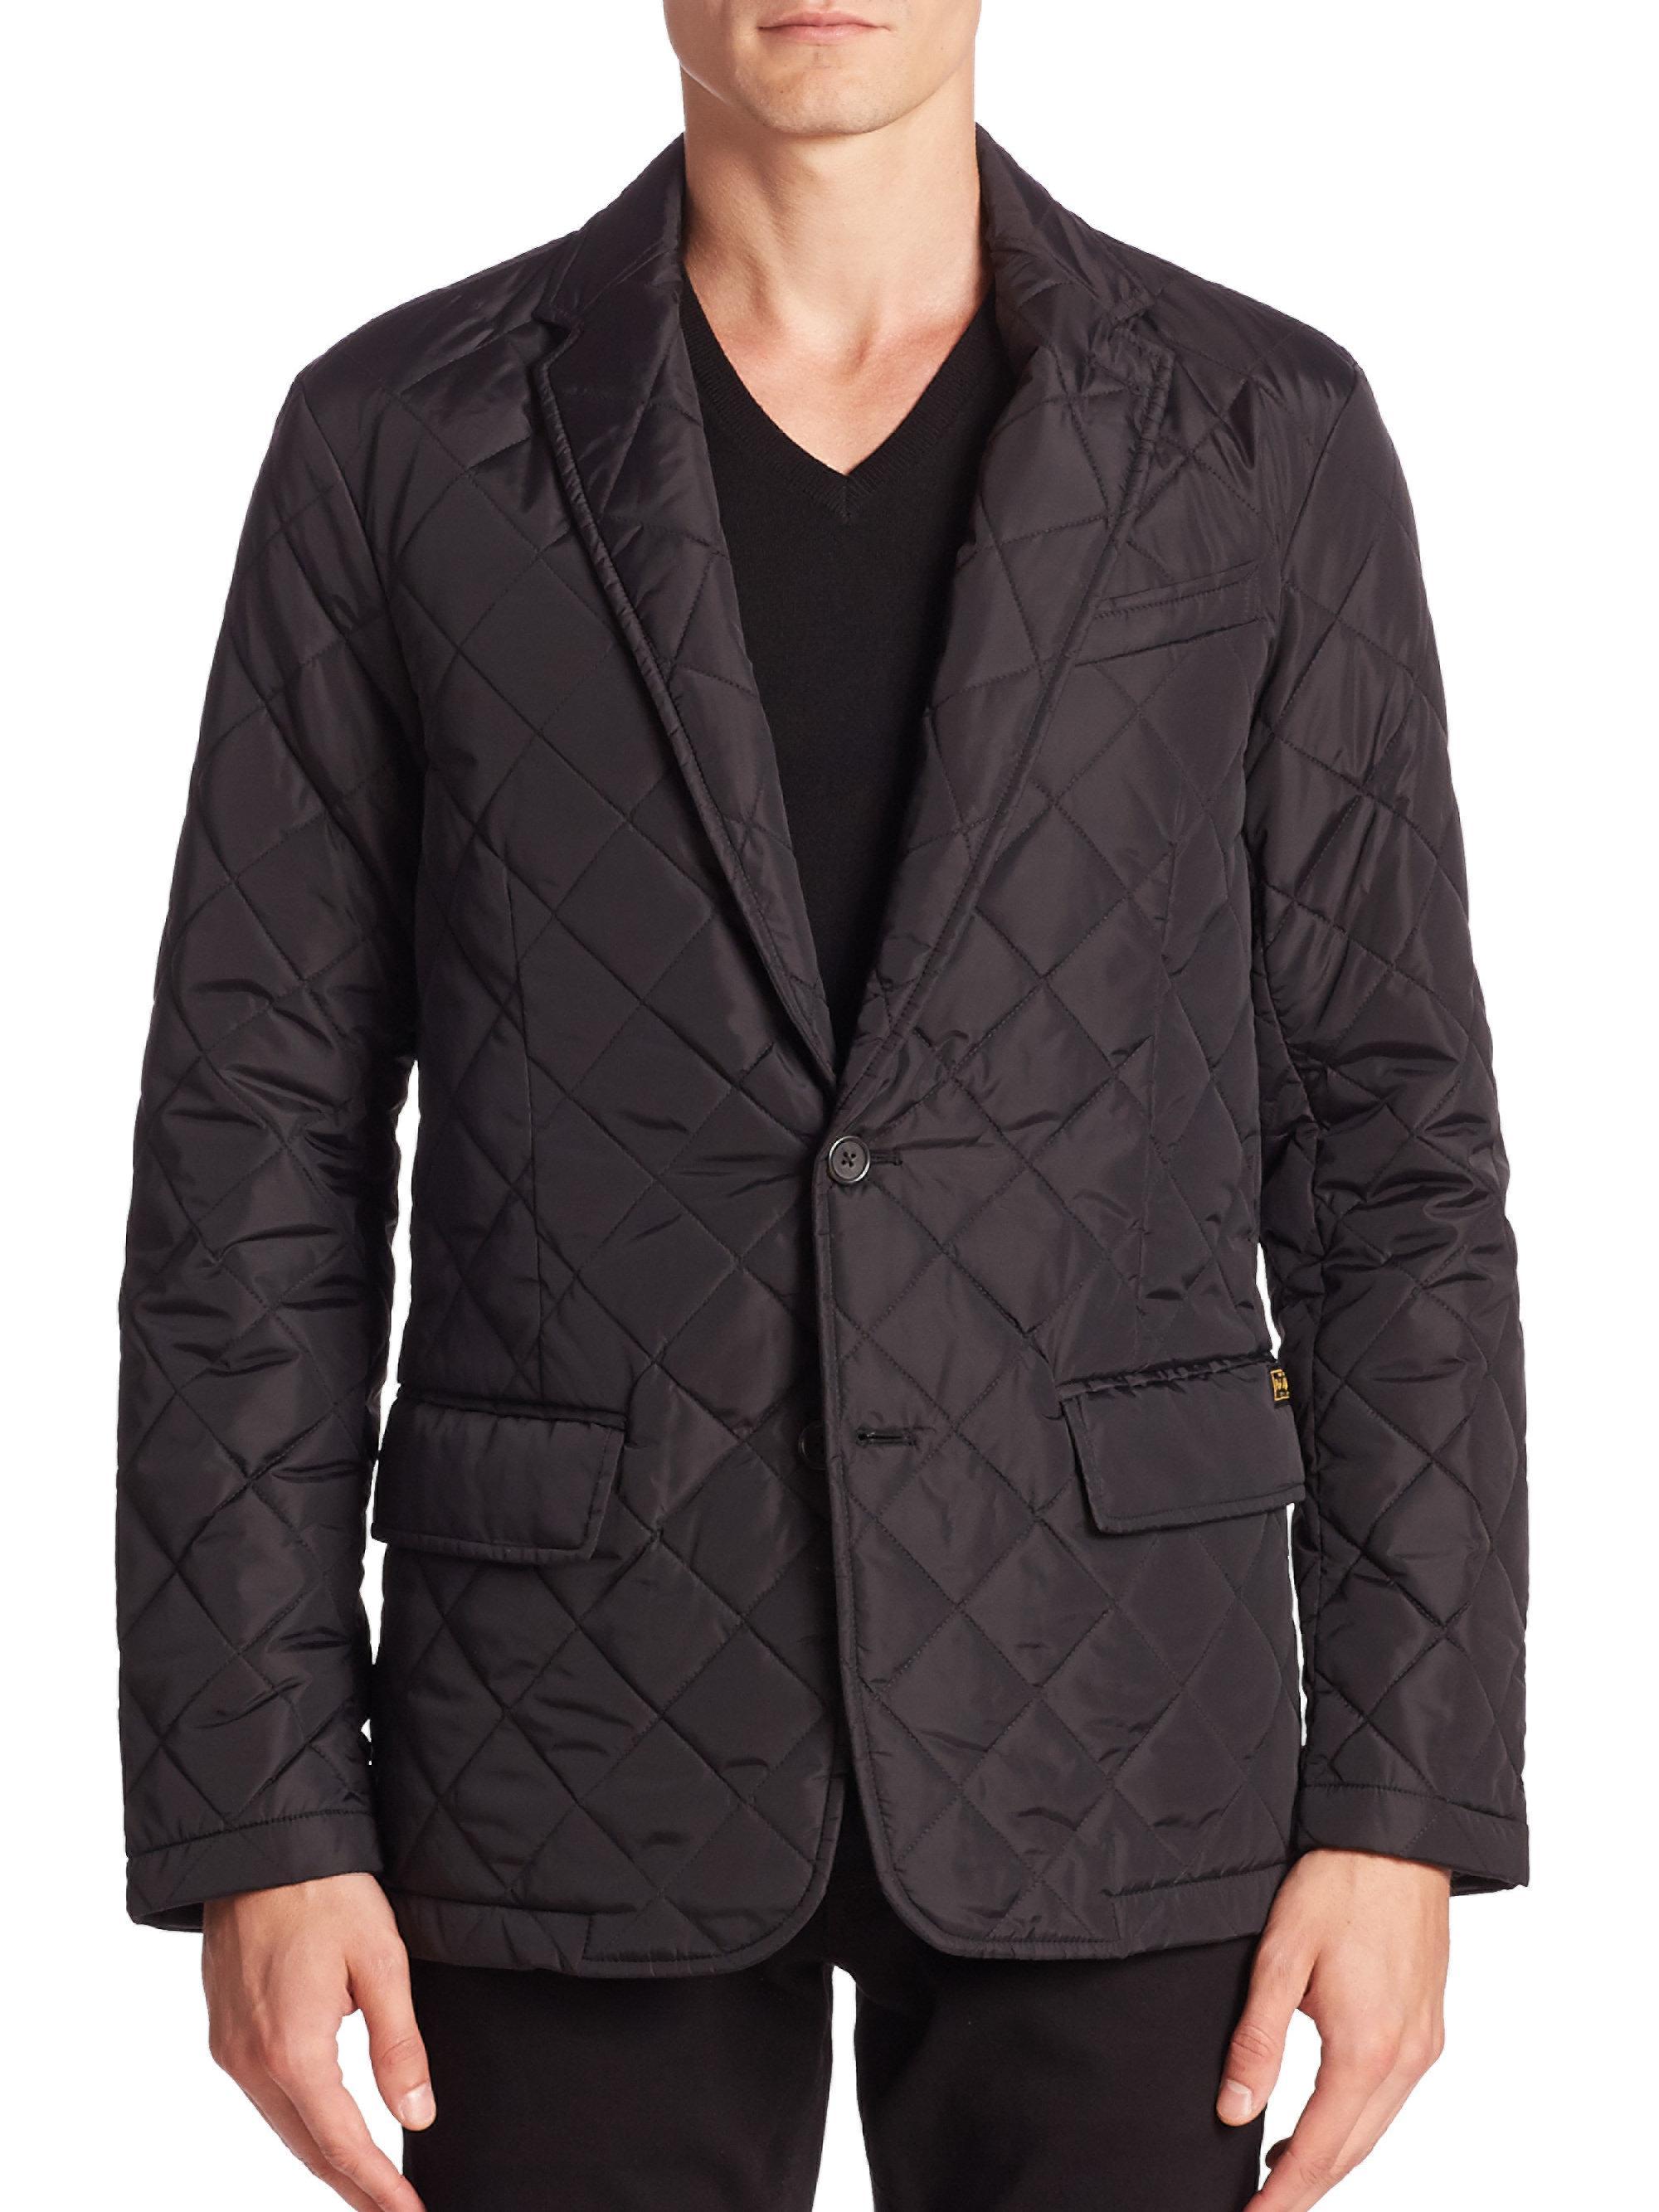 Lyst - Polo ralph lauren Hillsdale Quilted Sportcoat in Blue for Men : mens quilted sport coat - Adamdwight.com